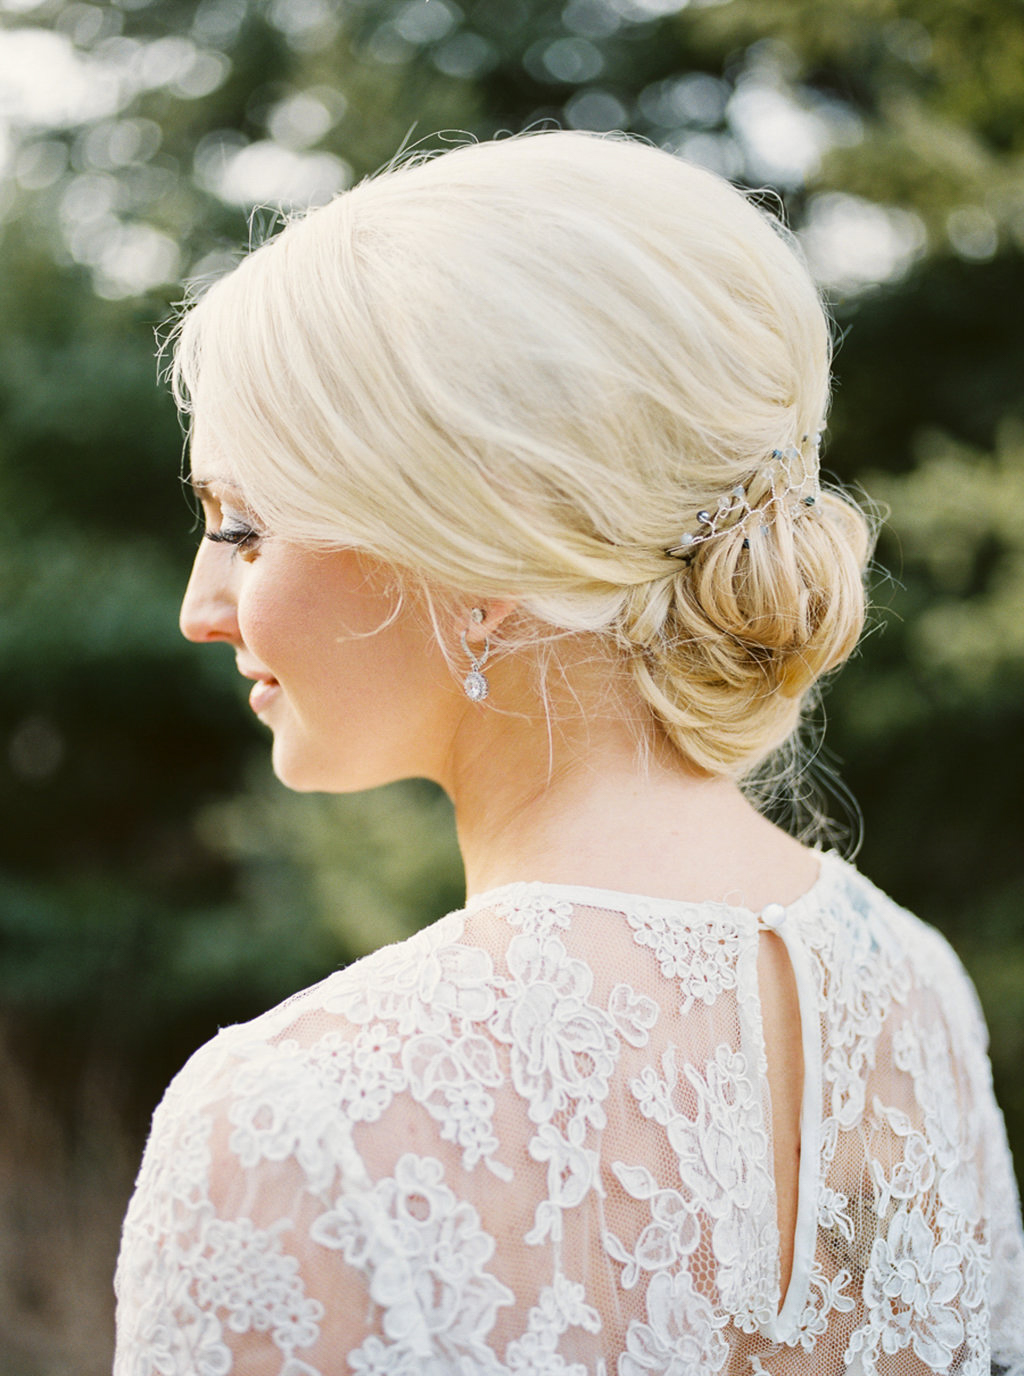 kayla-yestal-photography-vineyard-bride-swish-list-beamer-falls-manor-grimsby-engagement-7.jpg